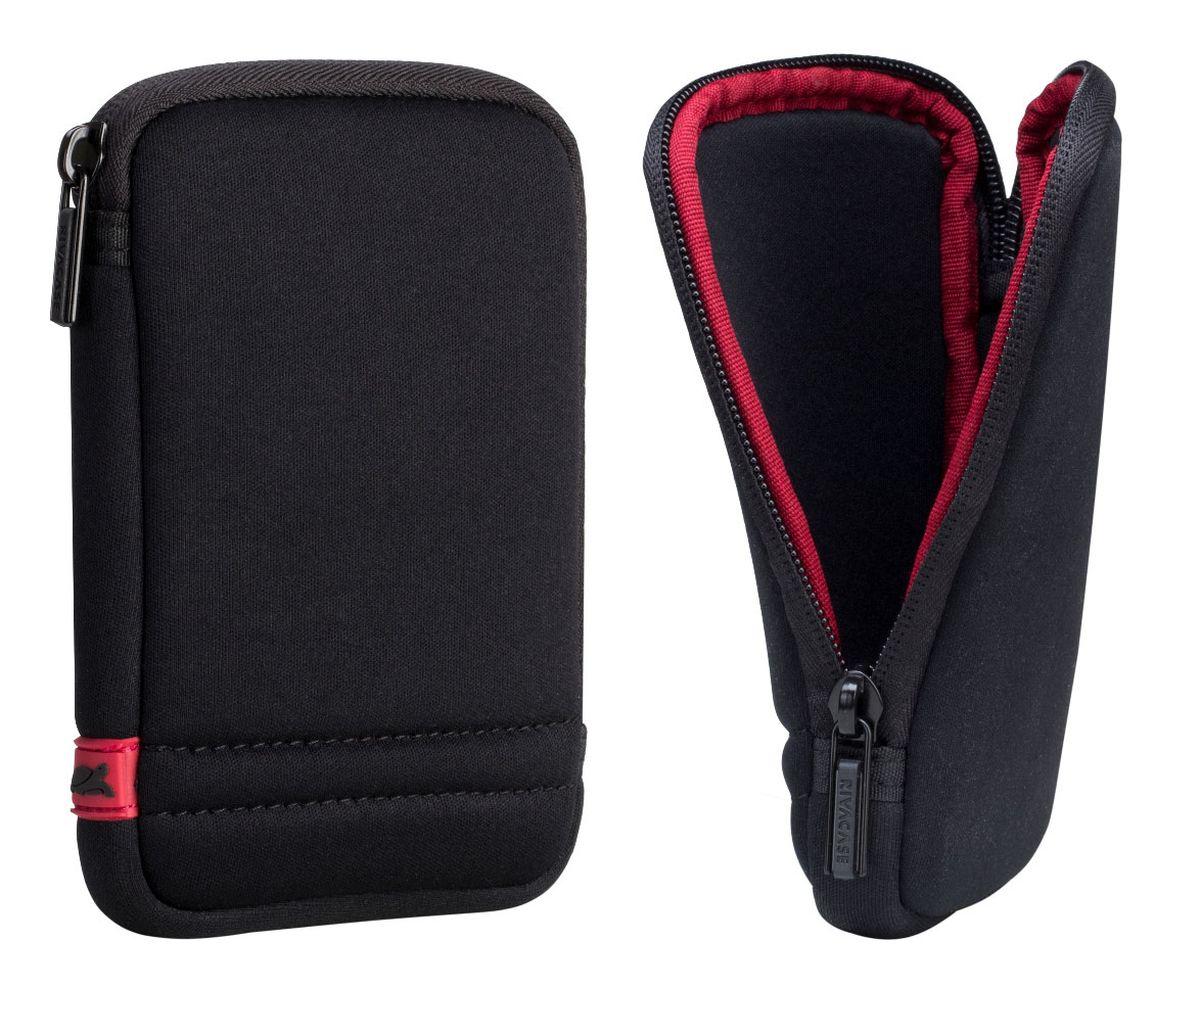 RIVACASE 5101 HDD 2,5 Case, Black чехол для жесткого диска сумка rivacase riva case 8830